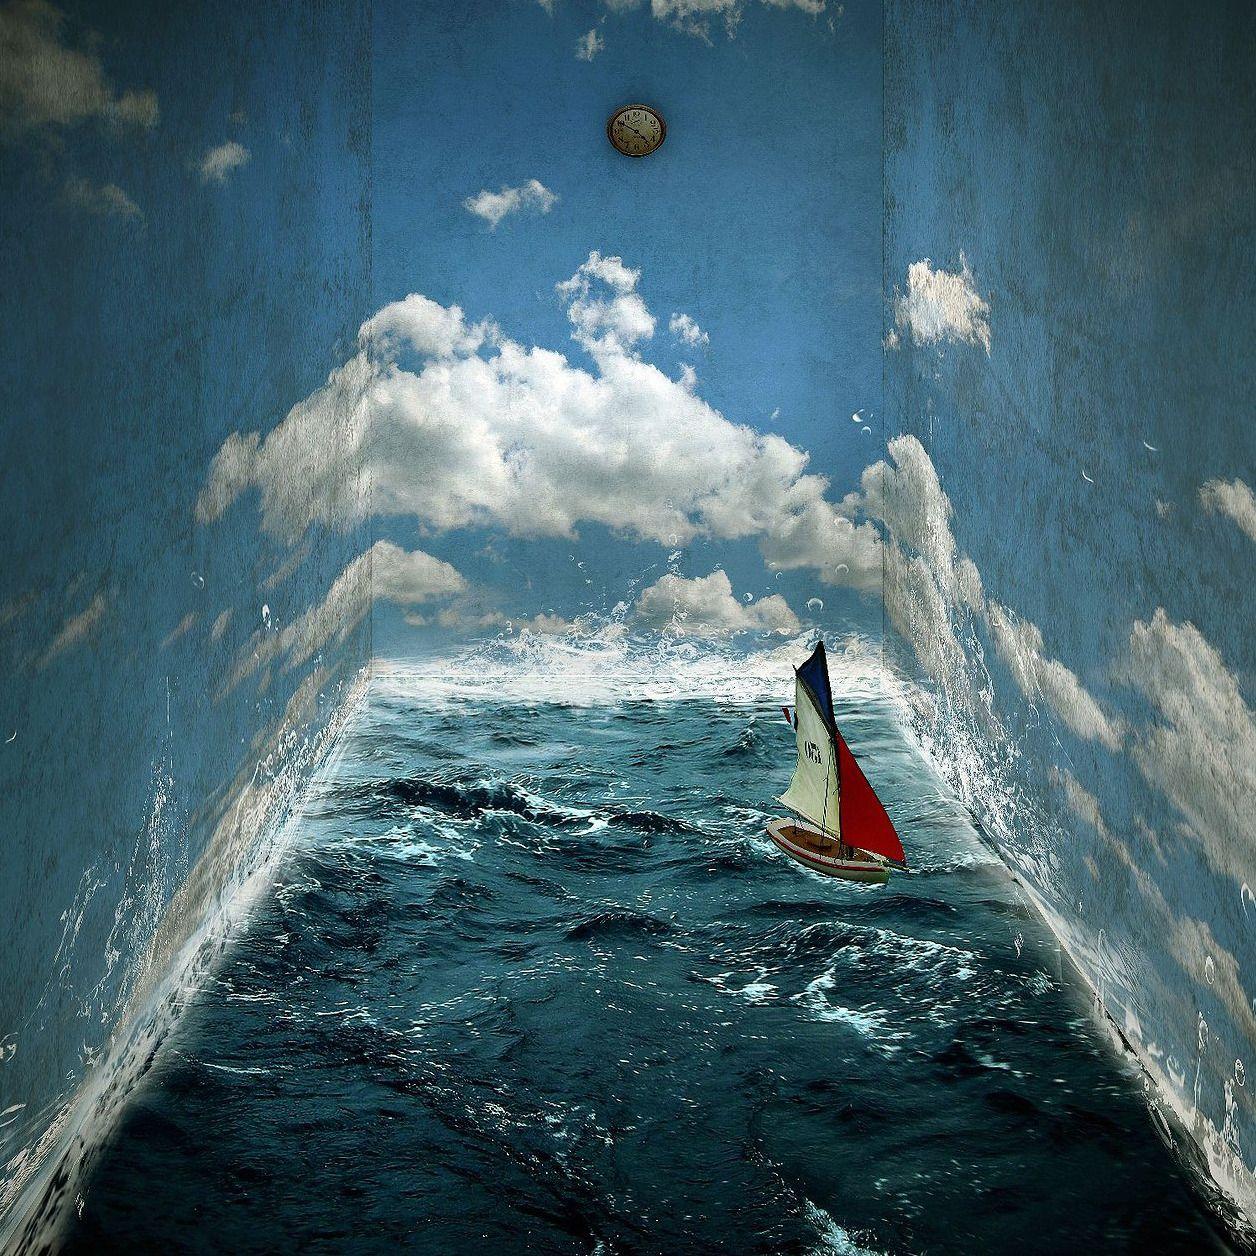 Michael Vincent Manalo - The Earth Room. Digital Mixed-Media, 80x80cm (2010)